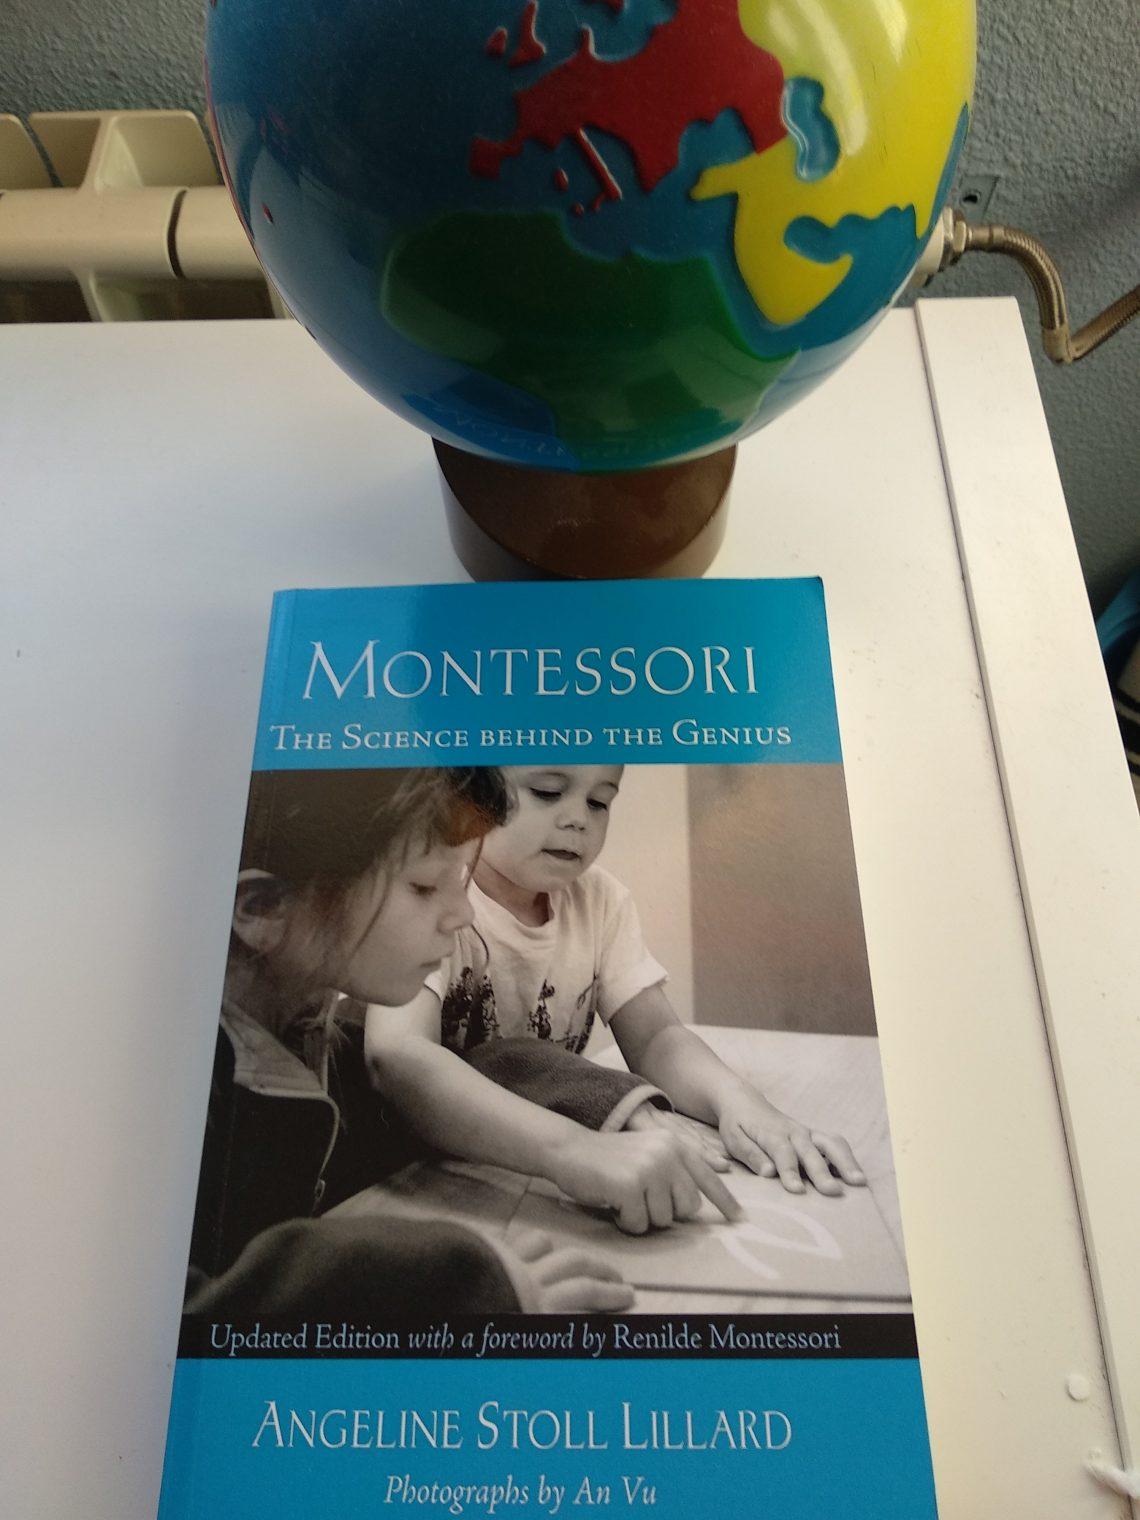 libro montessori the science behind the genius